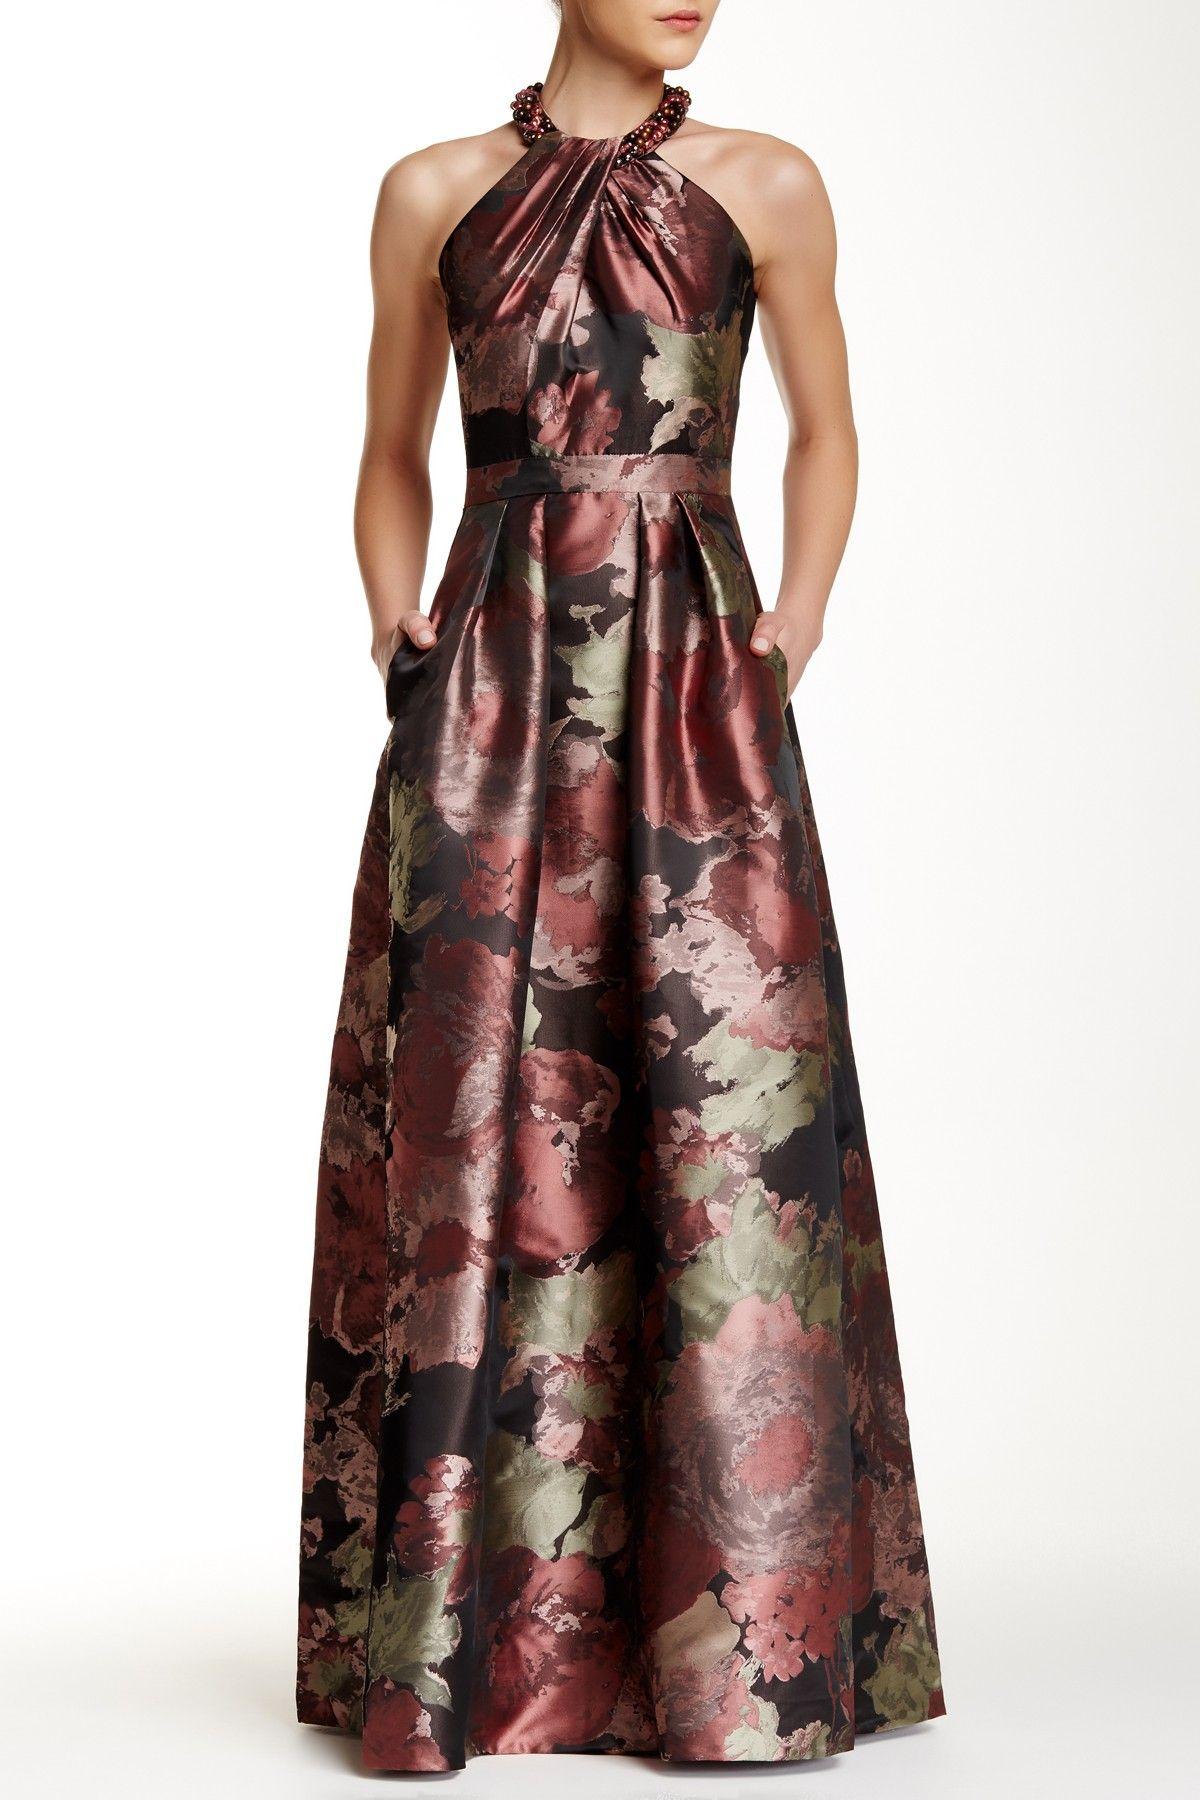 12351a4a000987 Beaded Halter Neck Dress by Carmen Carmen Marc Valvo on @HauteLook ...